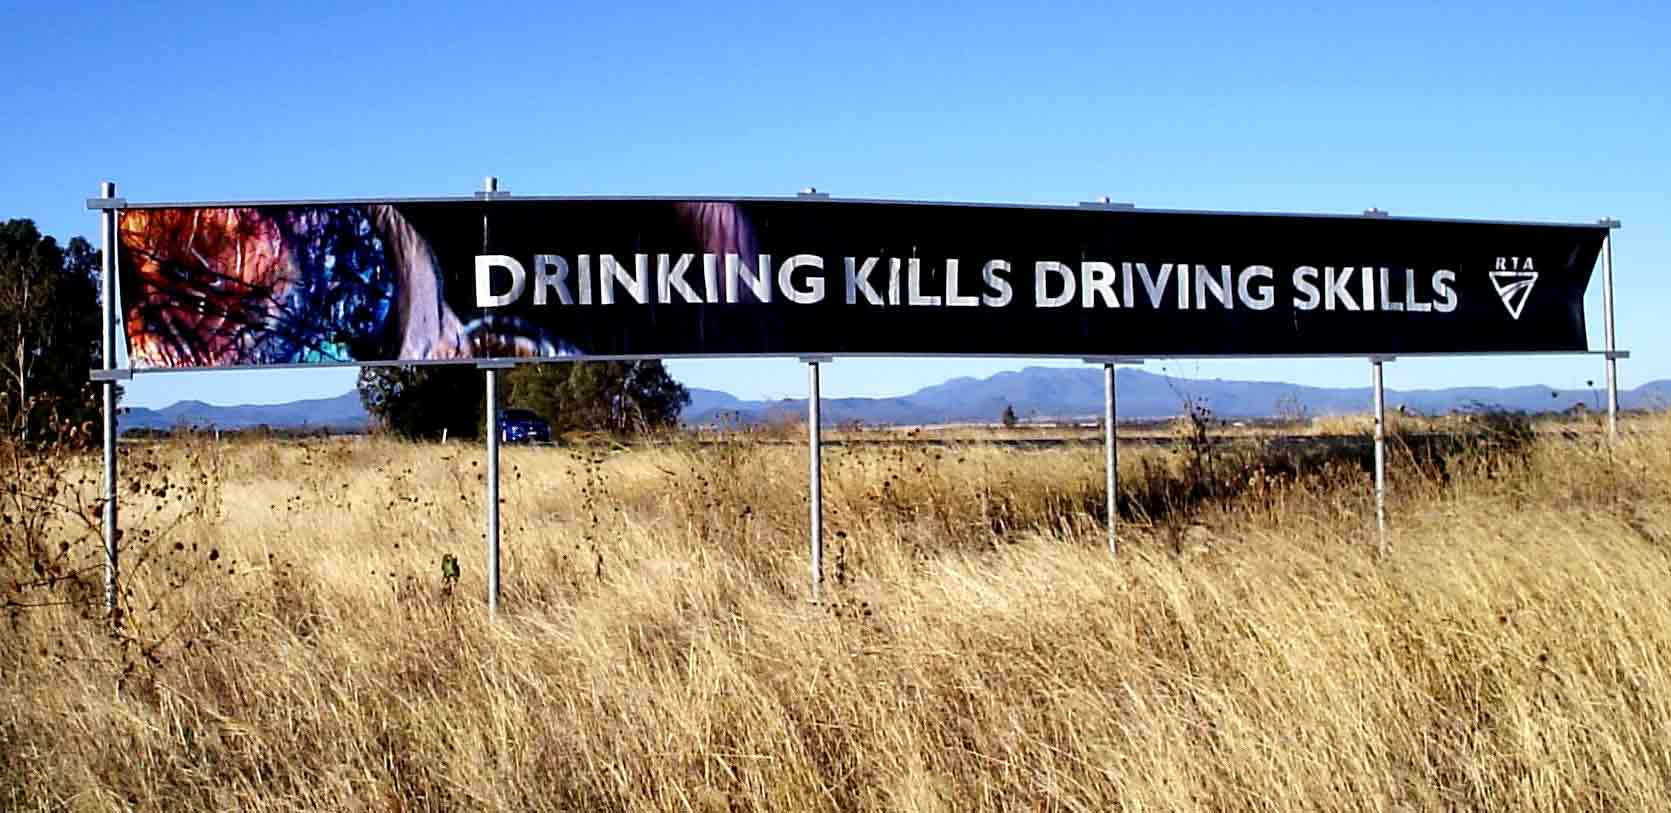 drinking kills driving skills